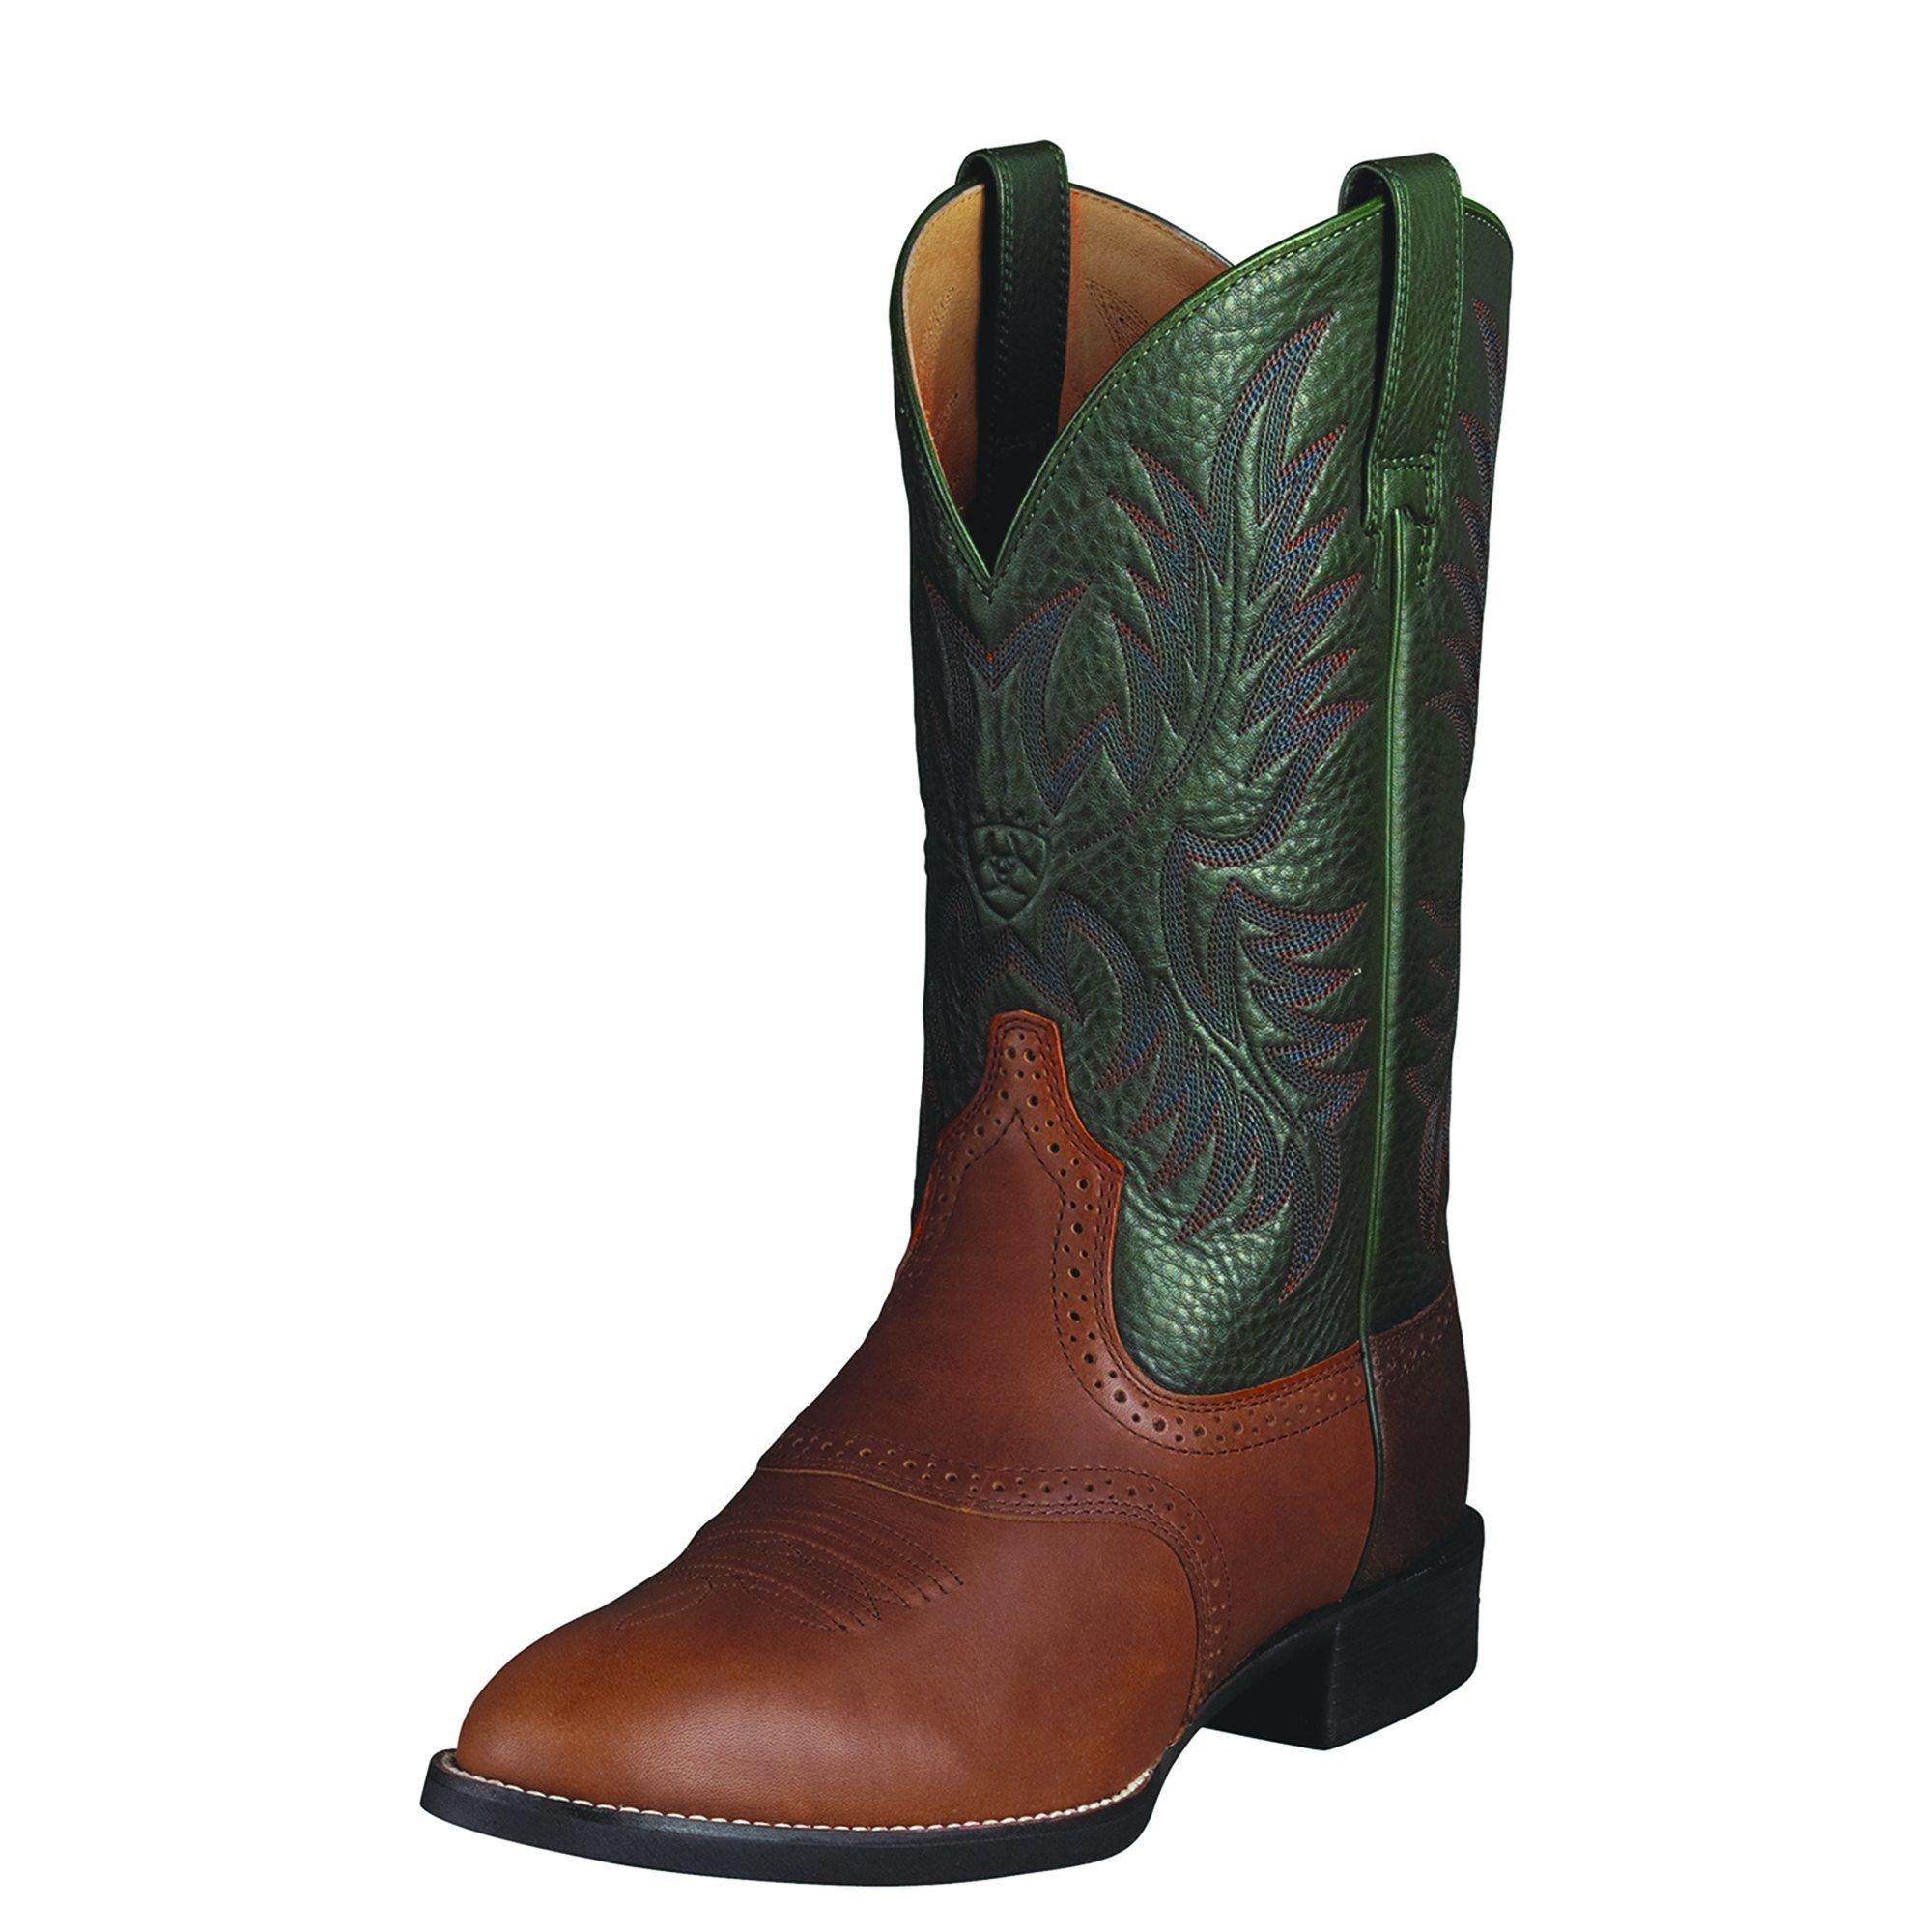 Ariat Men's Heritage Stockman Western Boot, Cedar/Green, 11 E US